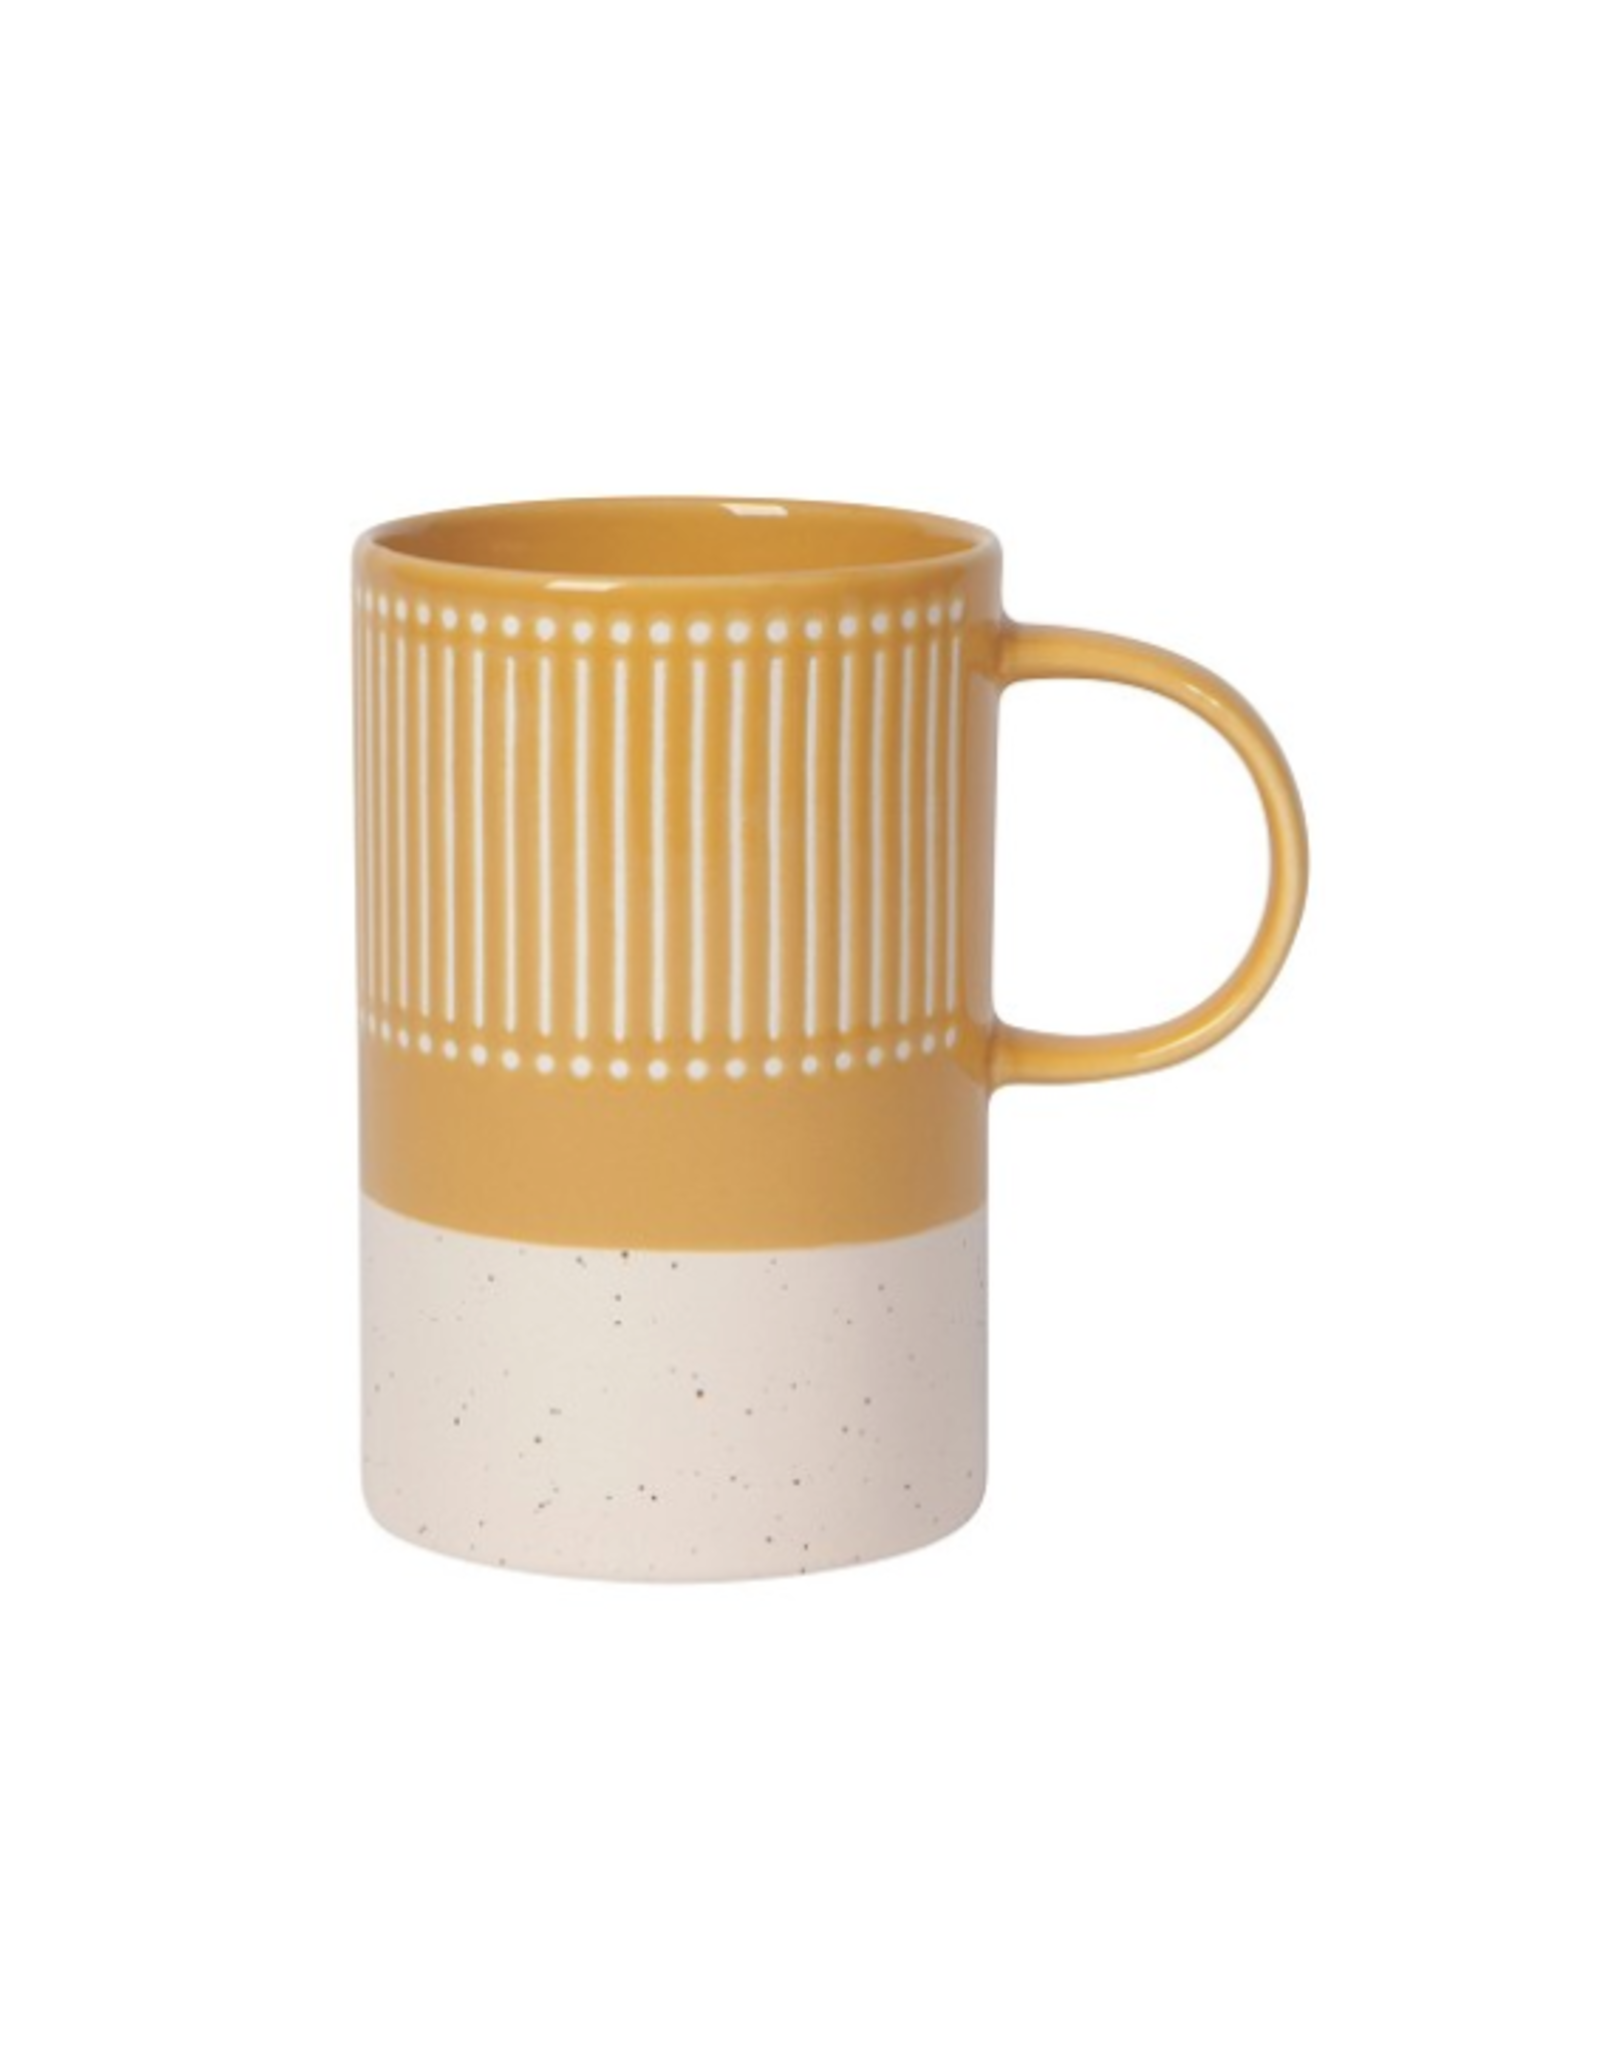 DCA - Mug/Modern Glaze, Golden, 14oz